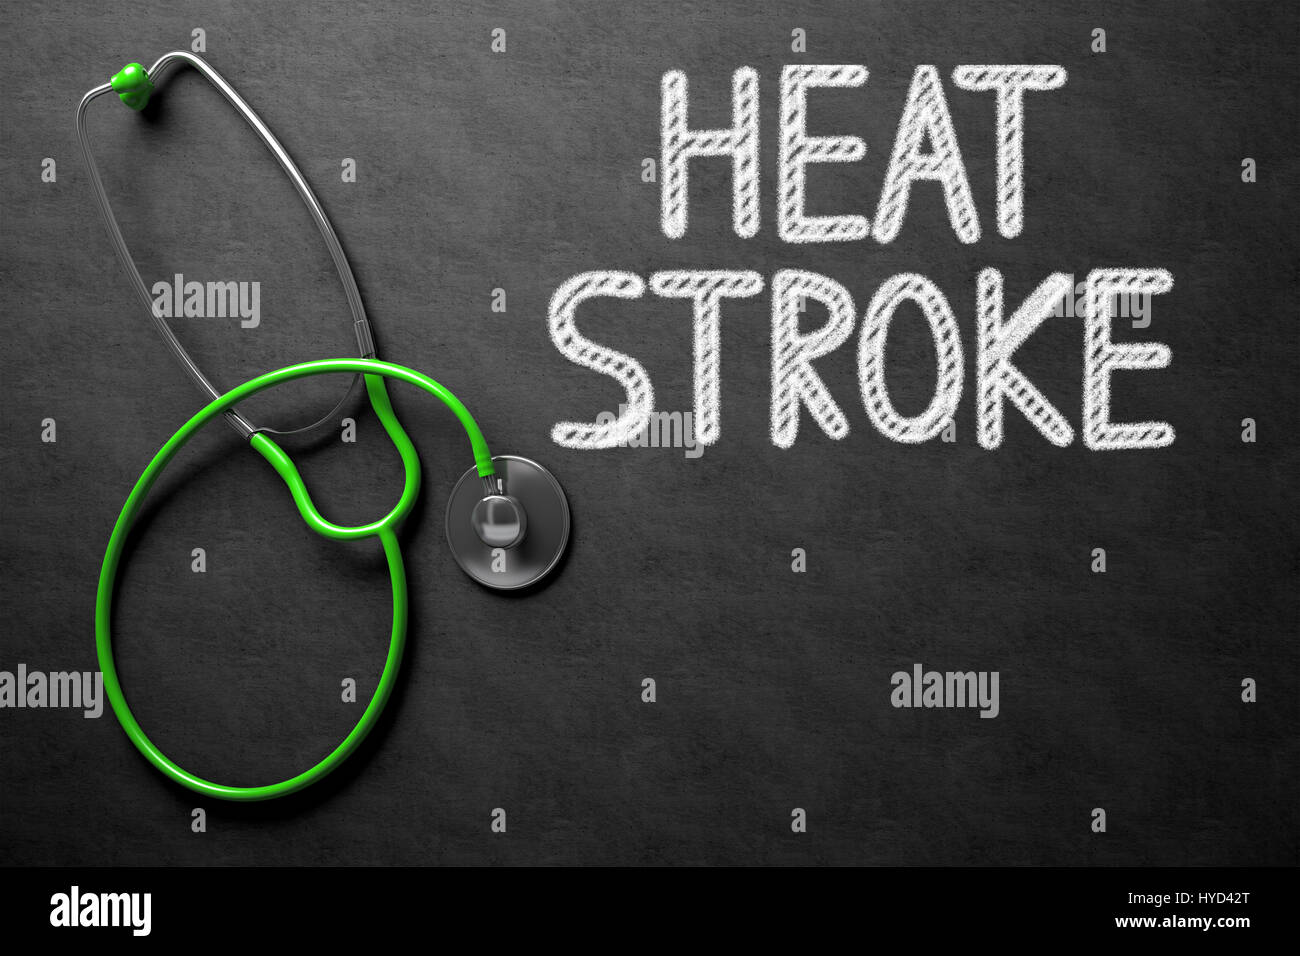 Heat Stroke Concept on Chalkboard. 3D Illustration. - Stock Image